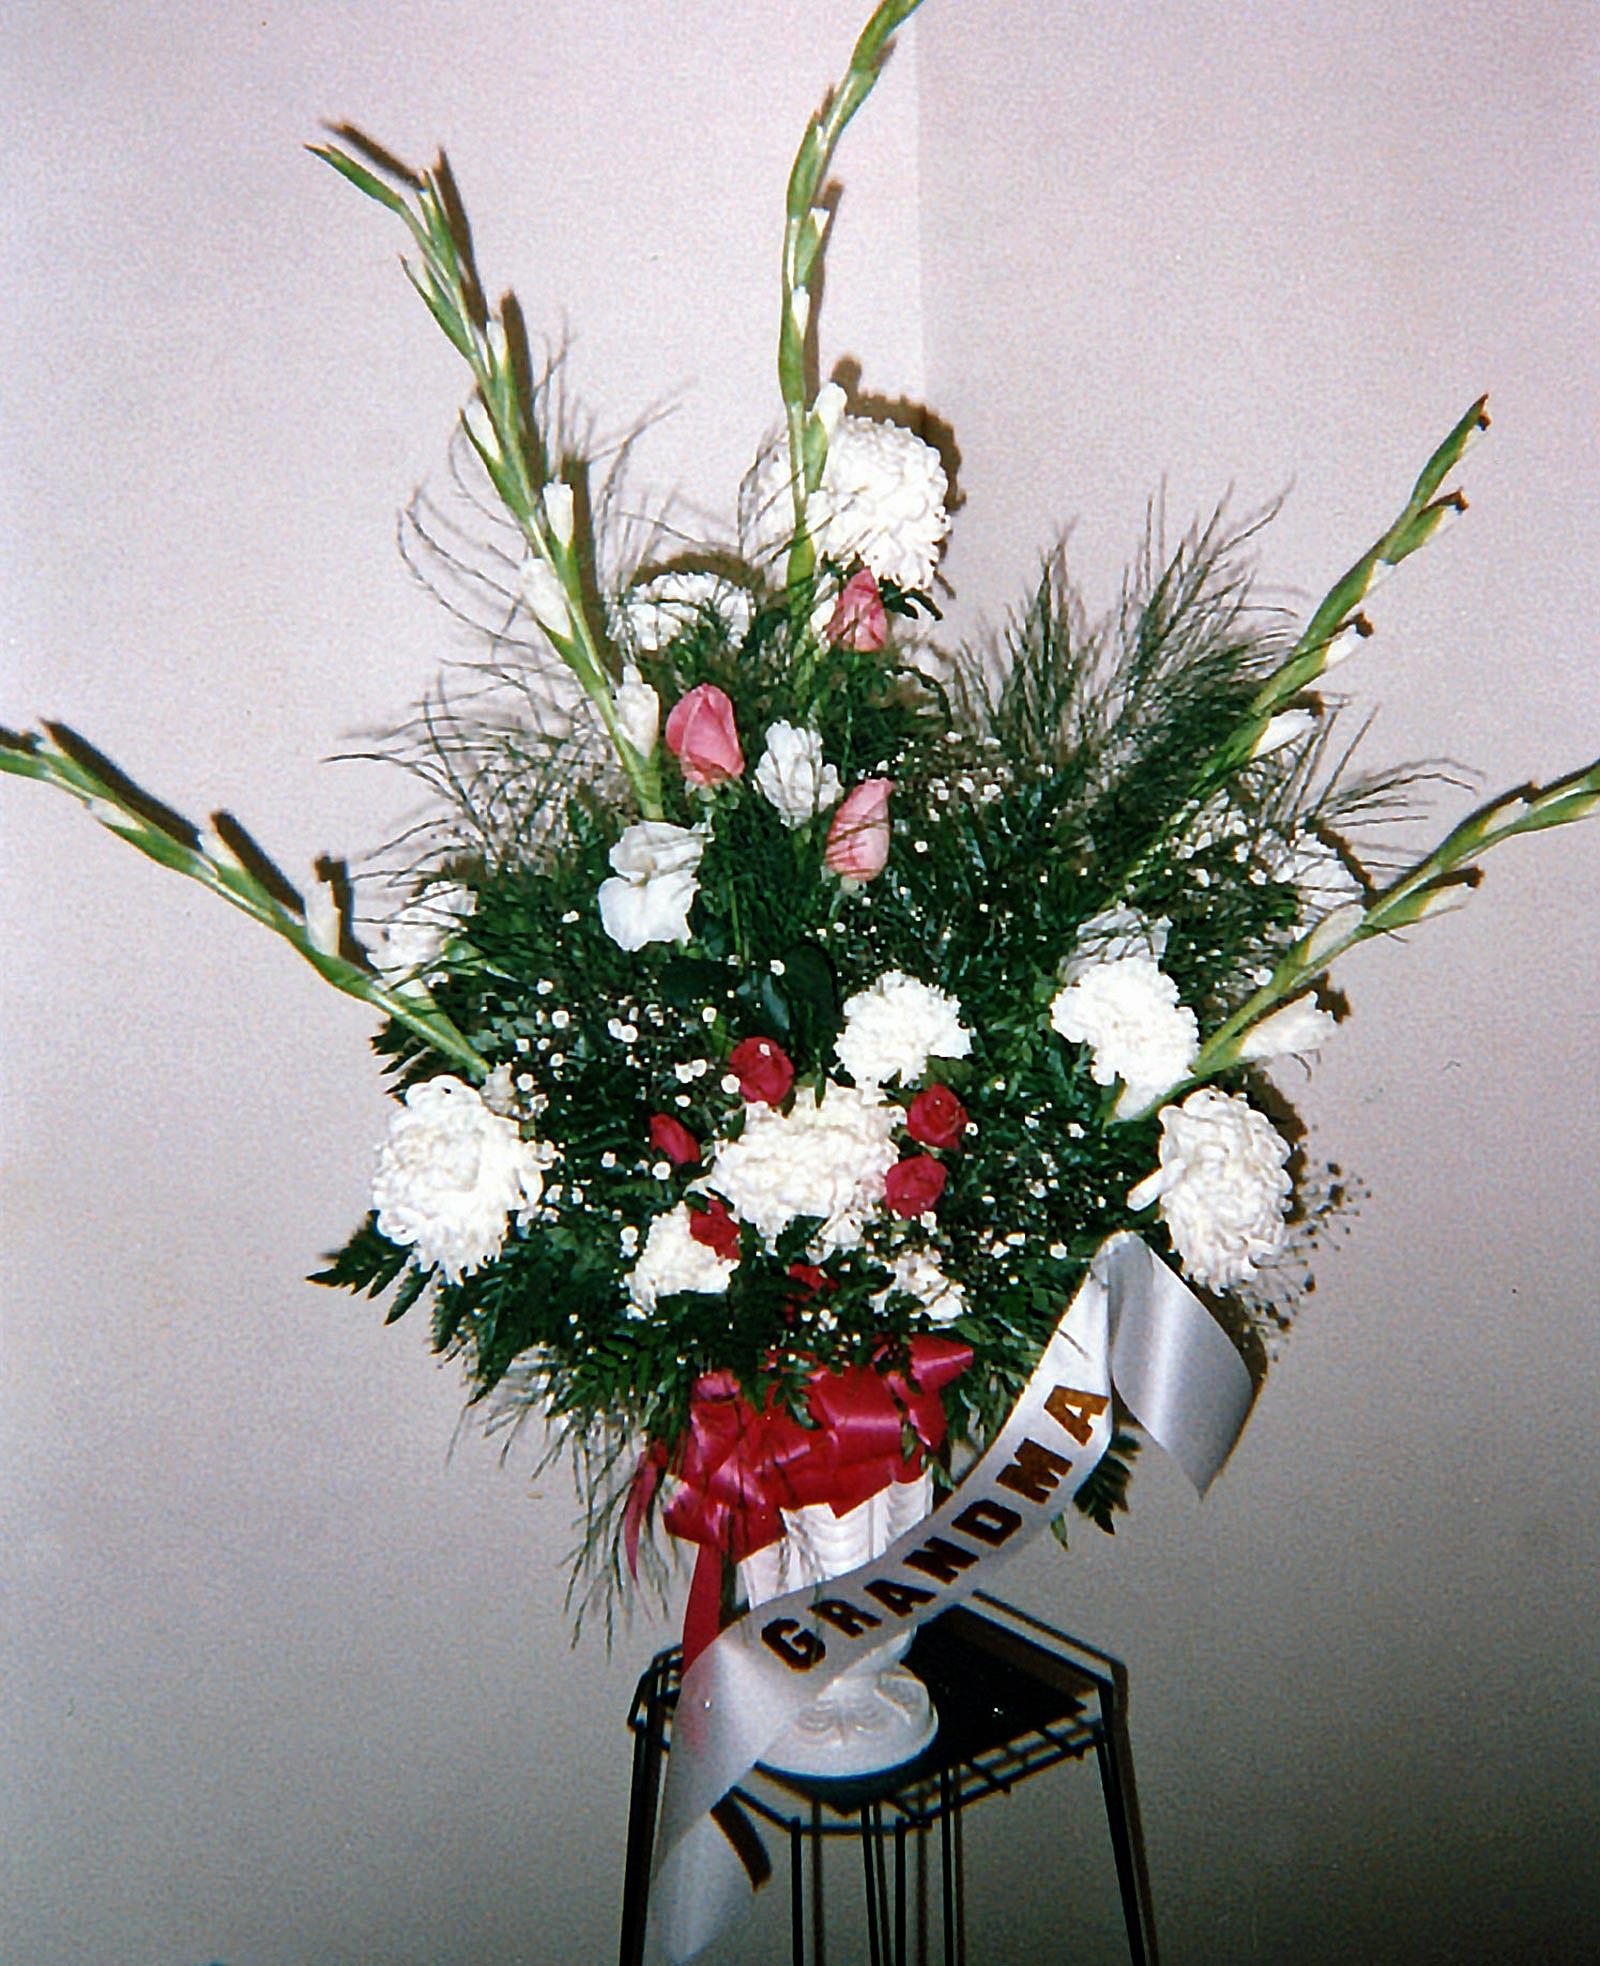 large sympathy arrangement, family - fresh flowers